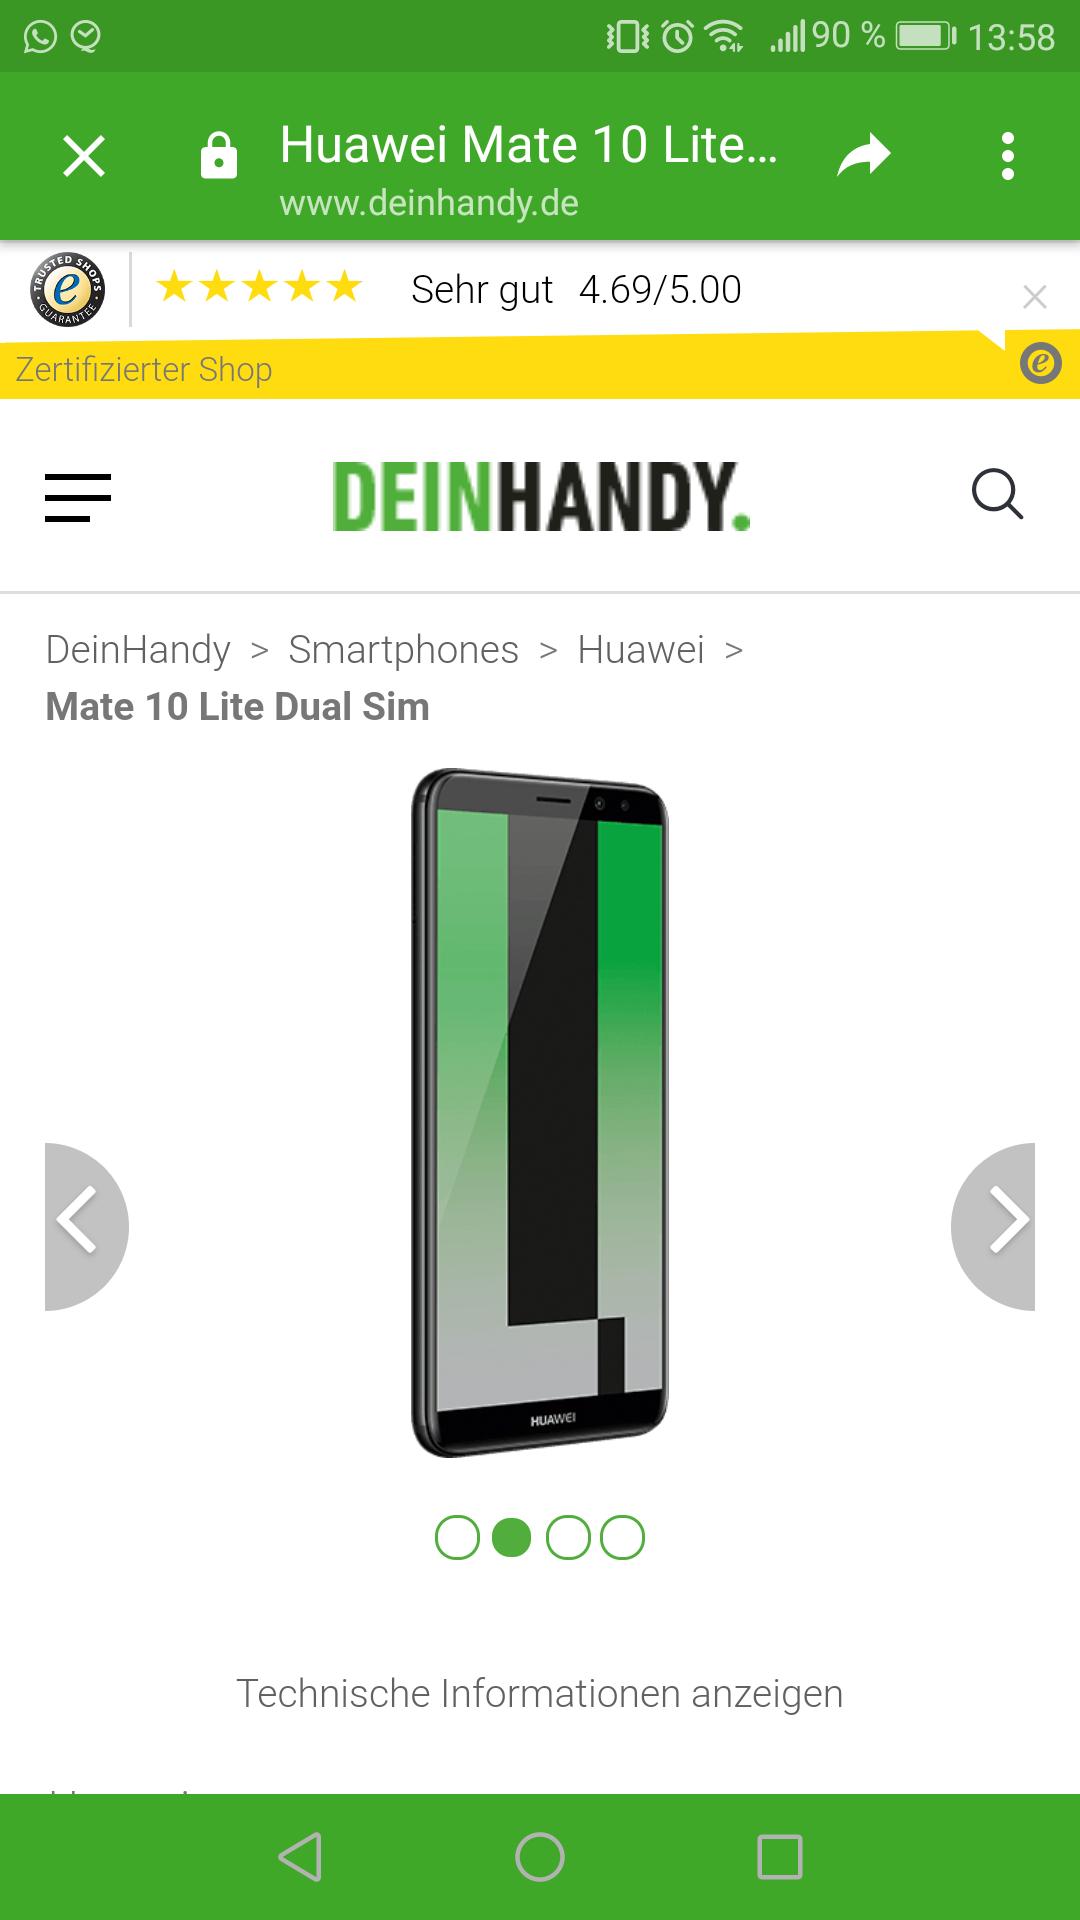 Huawei Mate 10 Lite + 5gb Lte Allnet